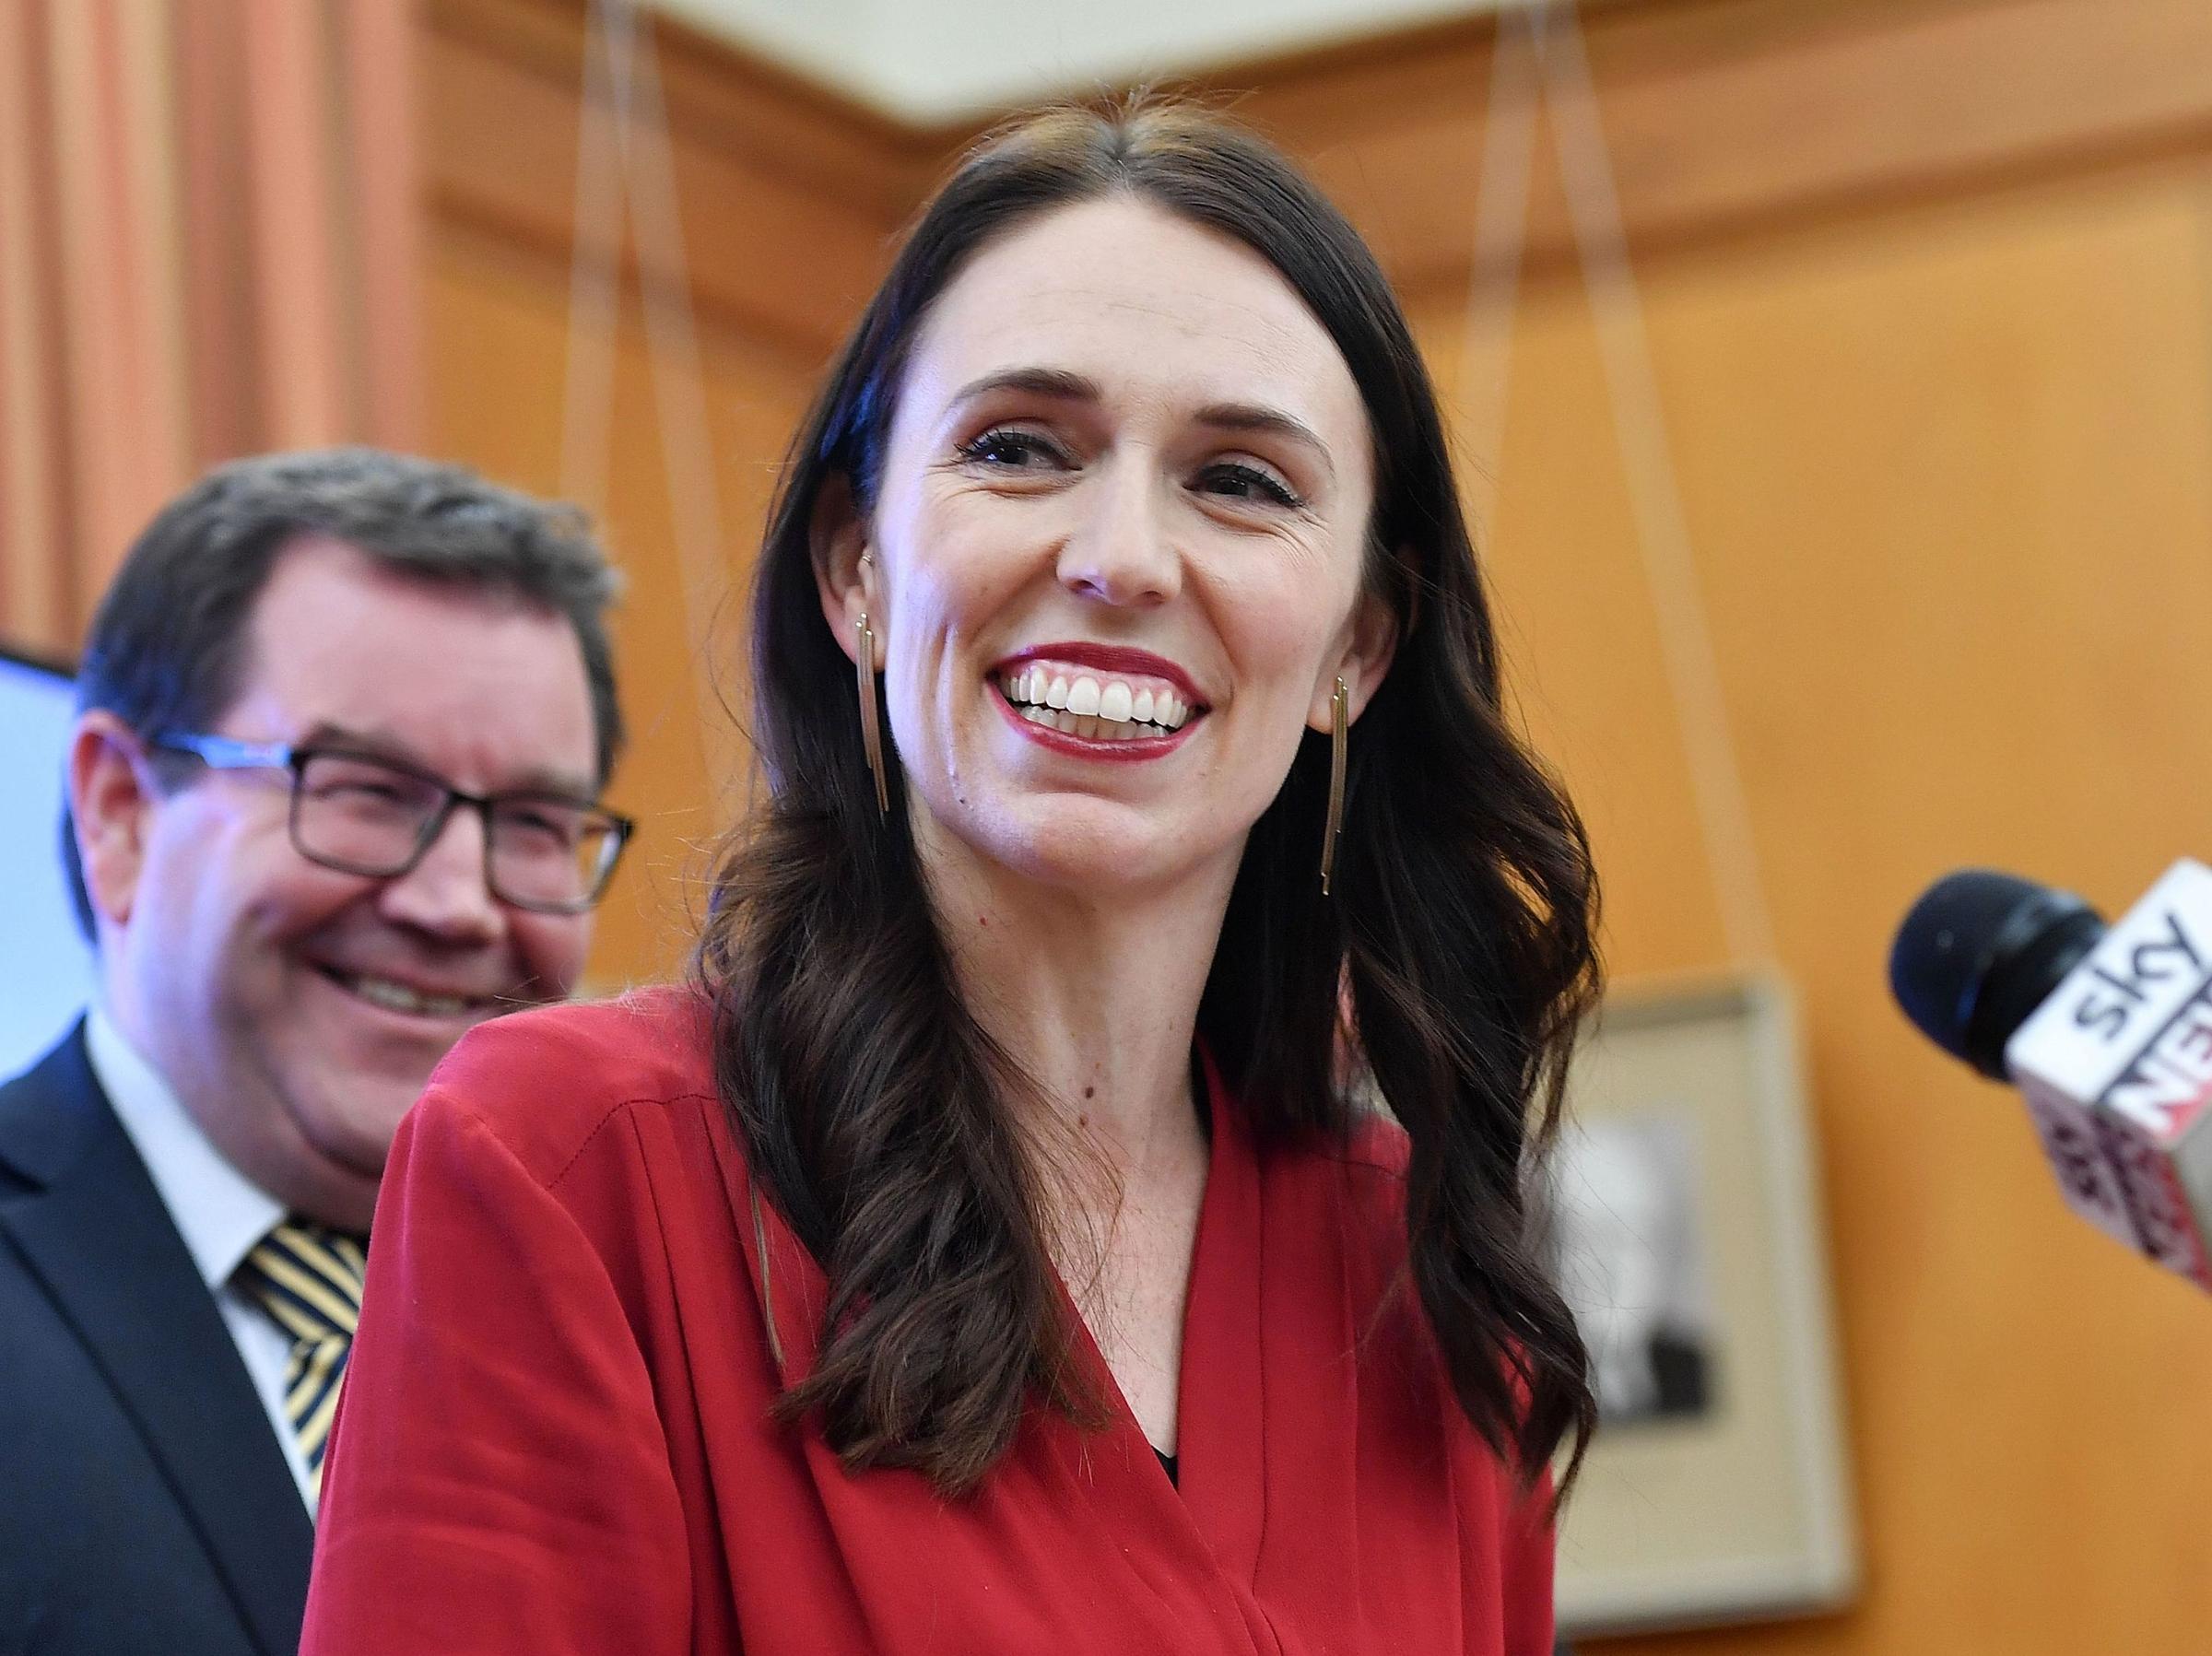 Jacinda Ardern Update: Meet Jacinda Ardern, 37, New Zealand's Next Prime Minister